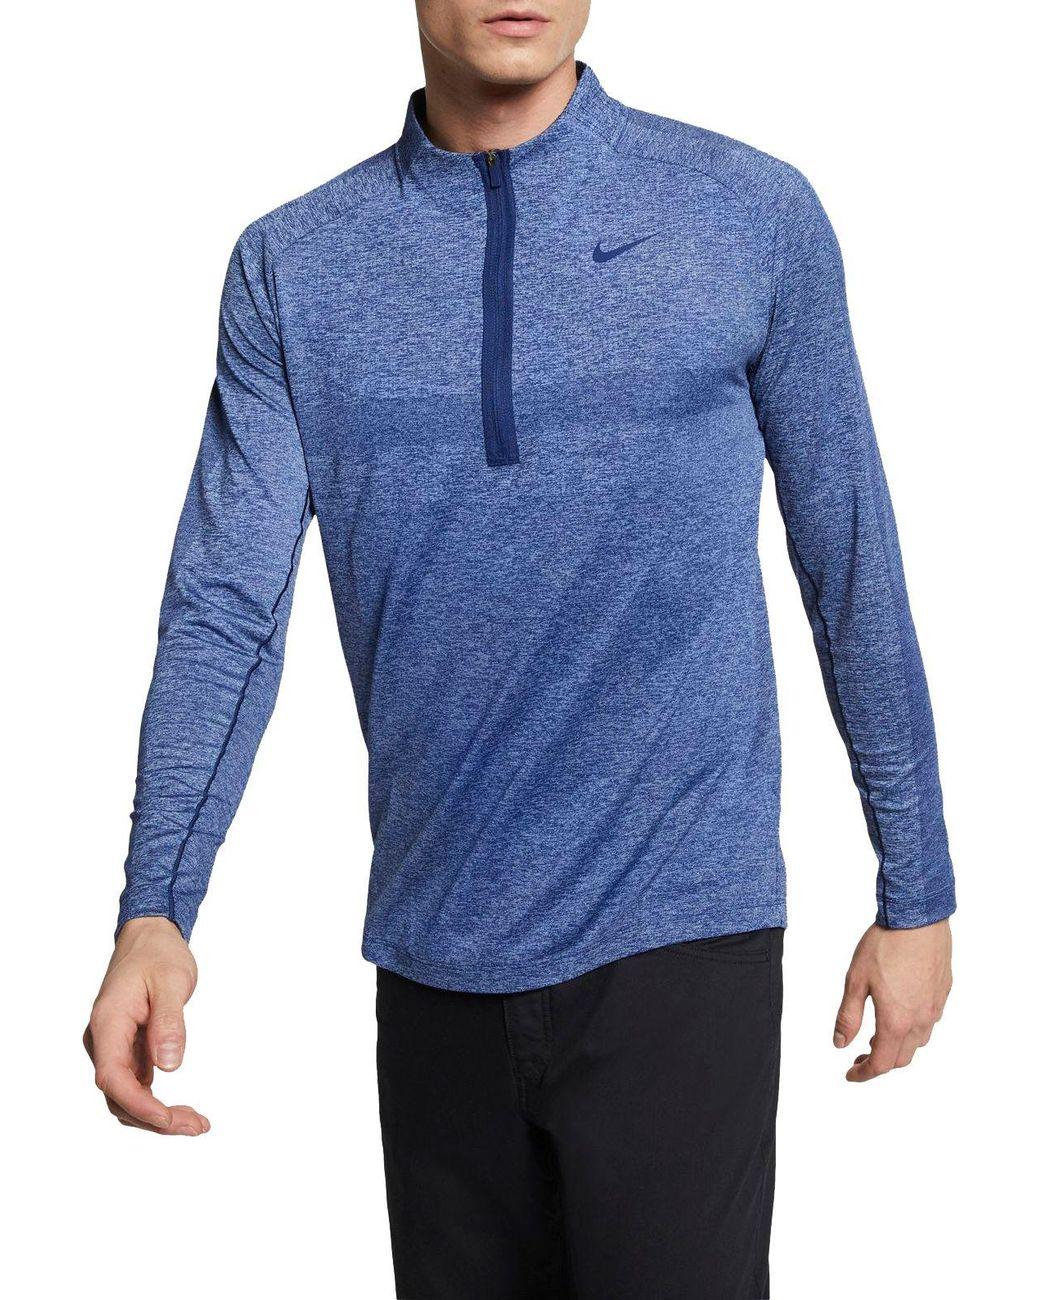 1f33901c7405 Lyst - Nike Seamless Statement Golf 1⁄2 Zip in Blue for Men